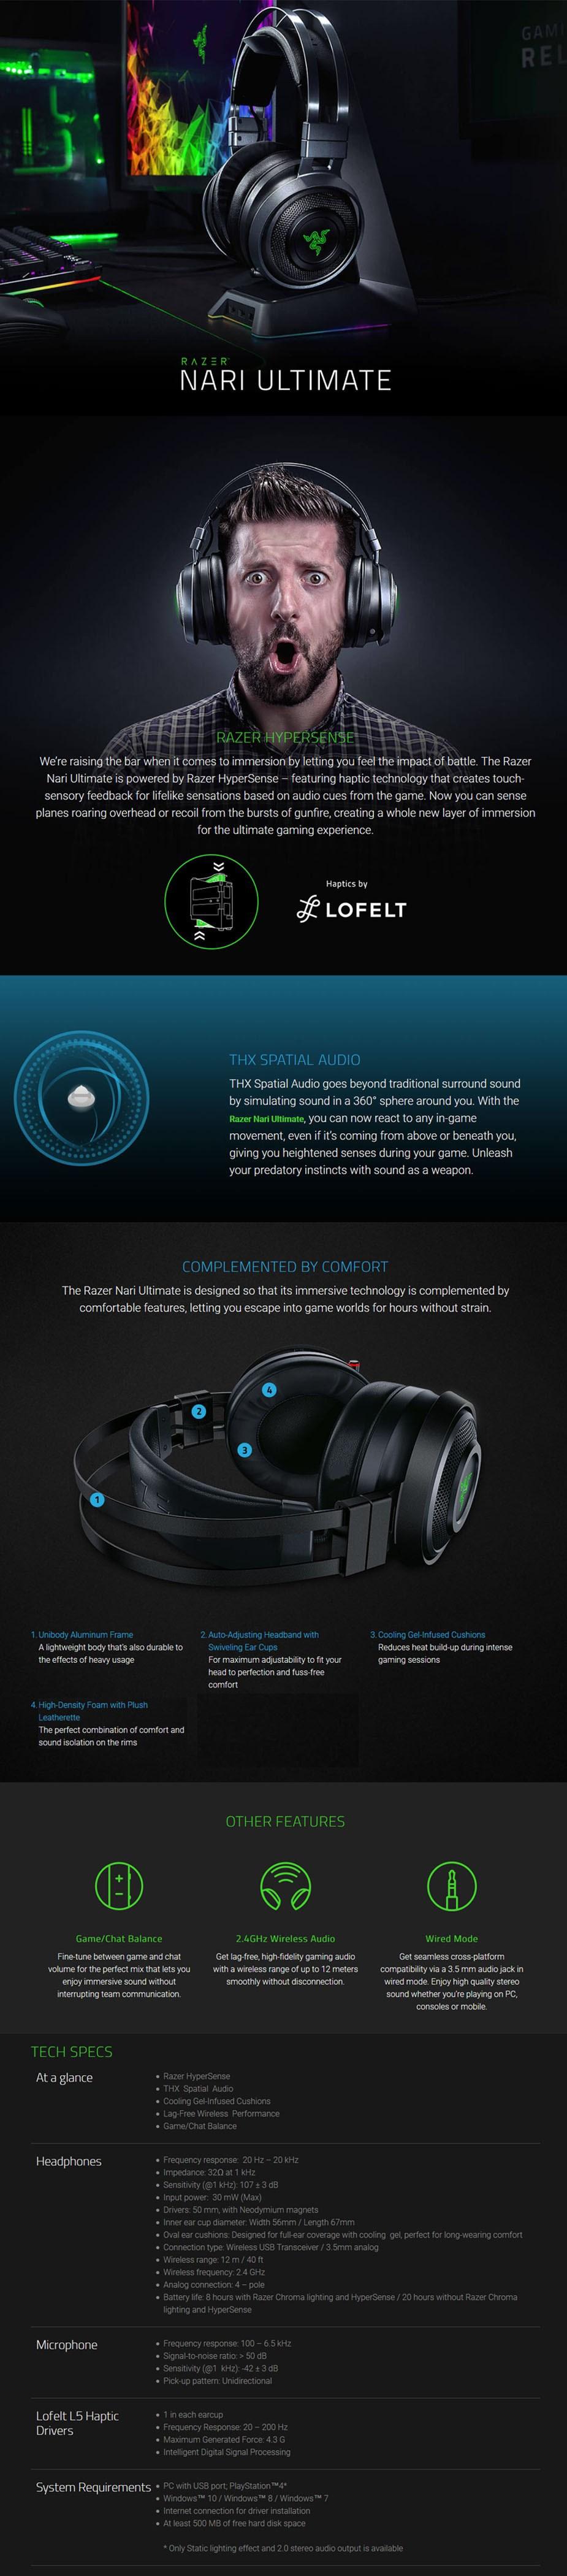 Razer Nari Ultimate Wireless Gaming Headset  - Overview 1